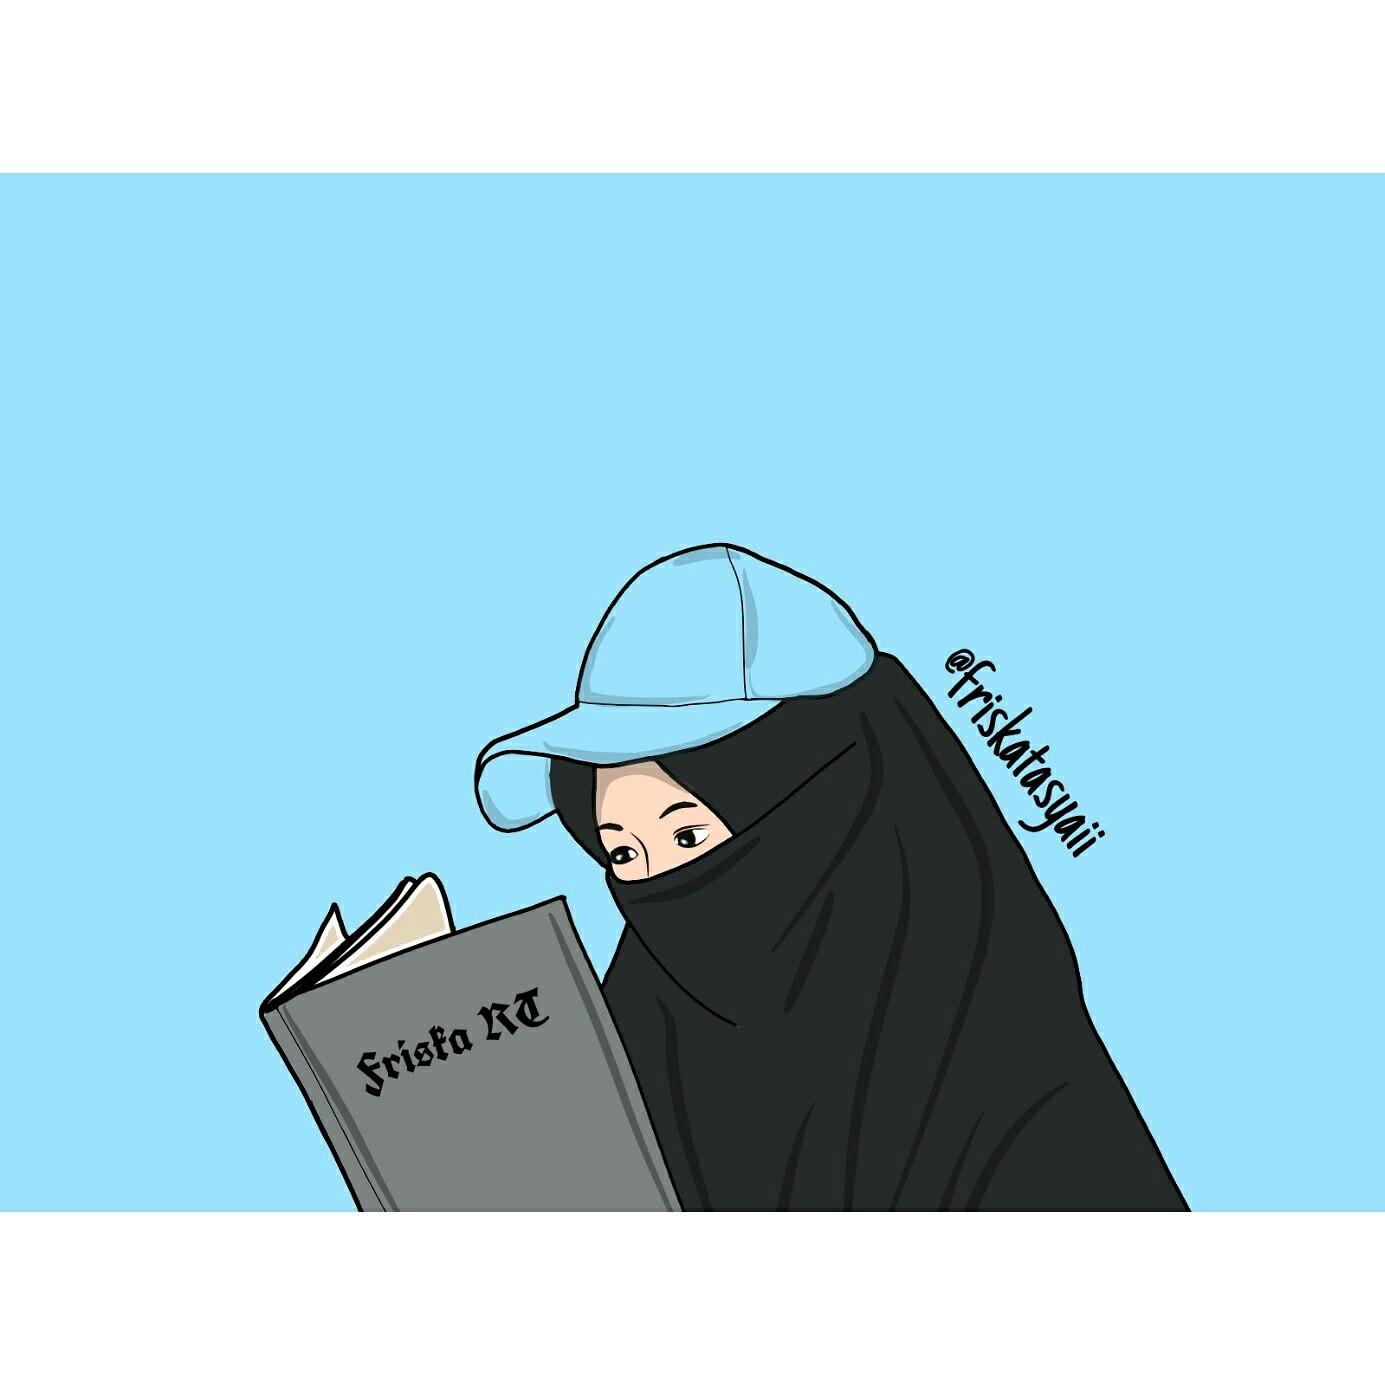 50 Gambar Kartun Muslimah Bercadar Cantik Berkacamata Kartun Muslimah Bercadar Gambar Ukhti 1385x1385 Download Hd Wallpaper Wallpapertip